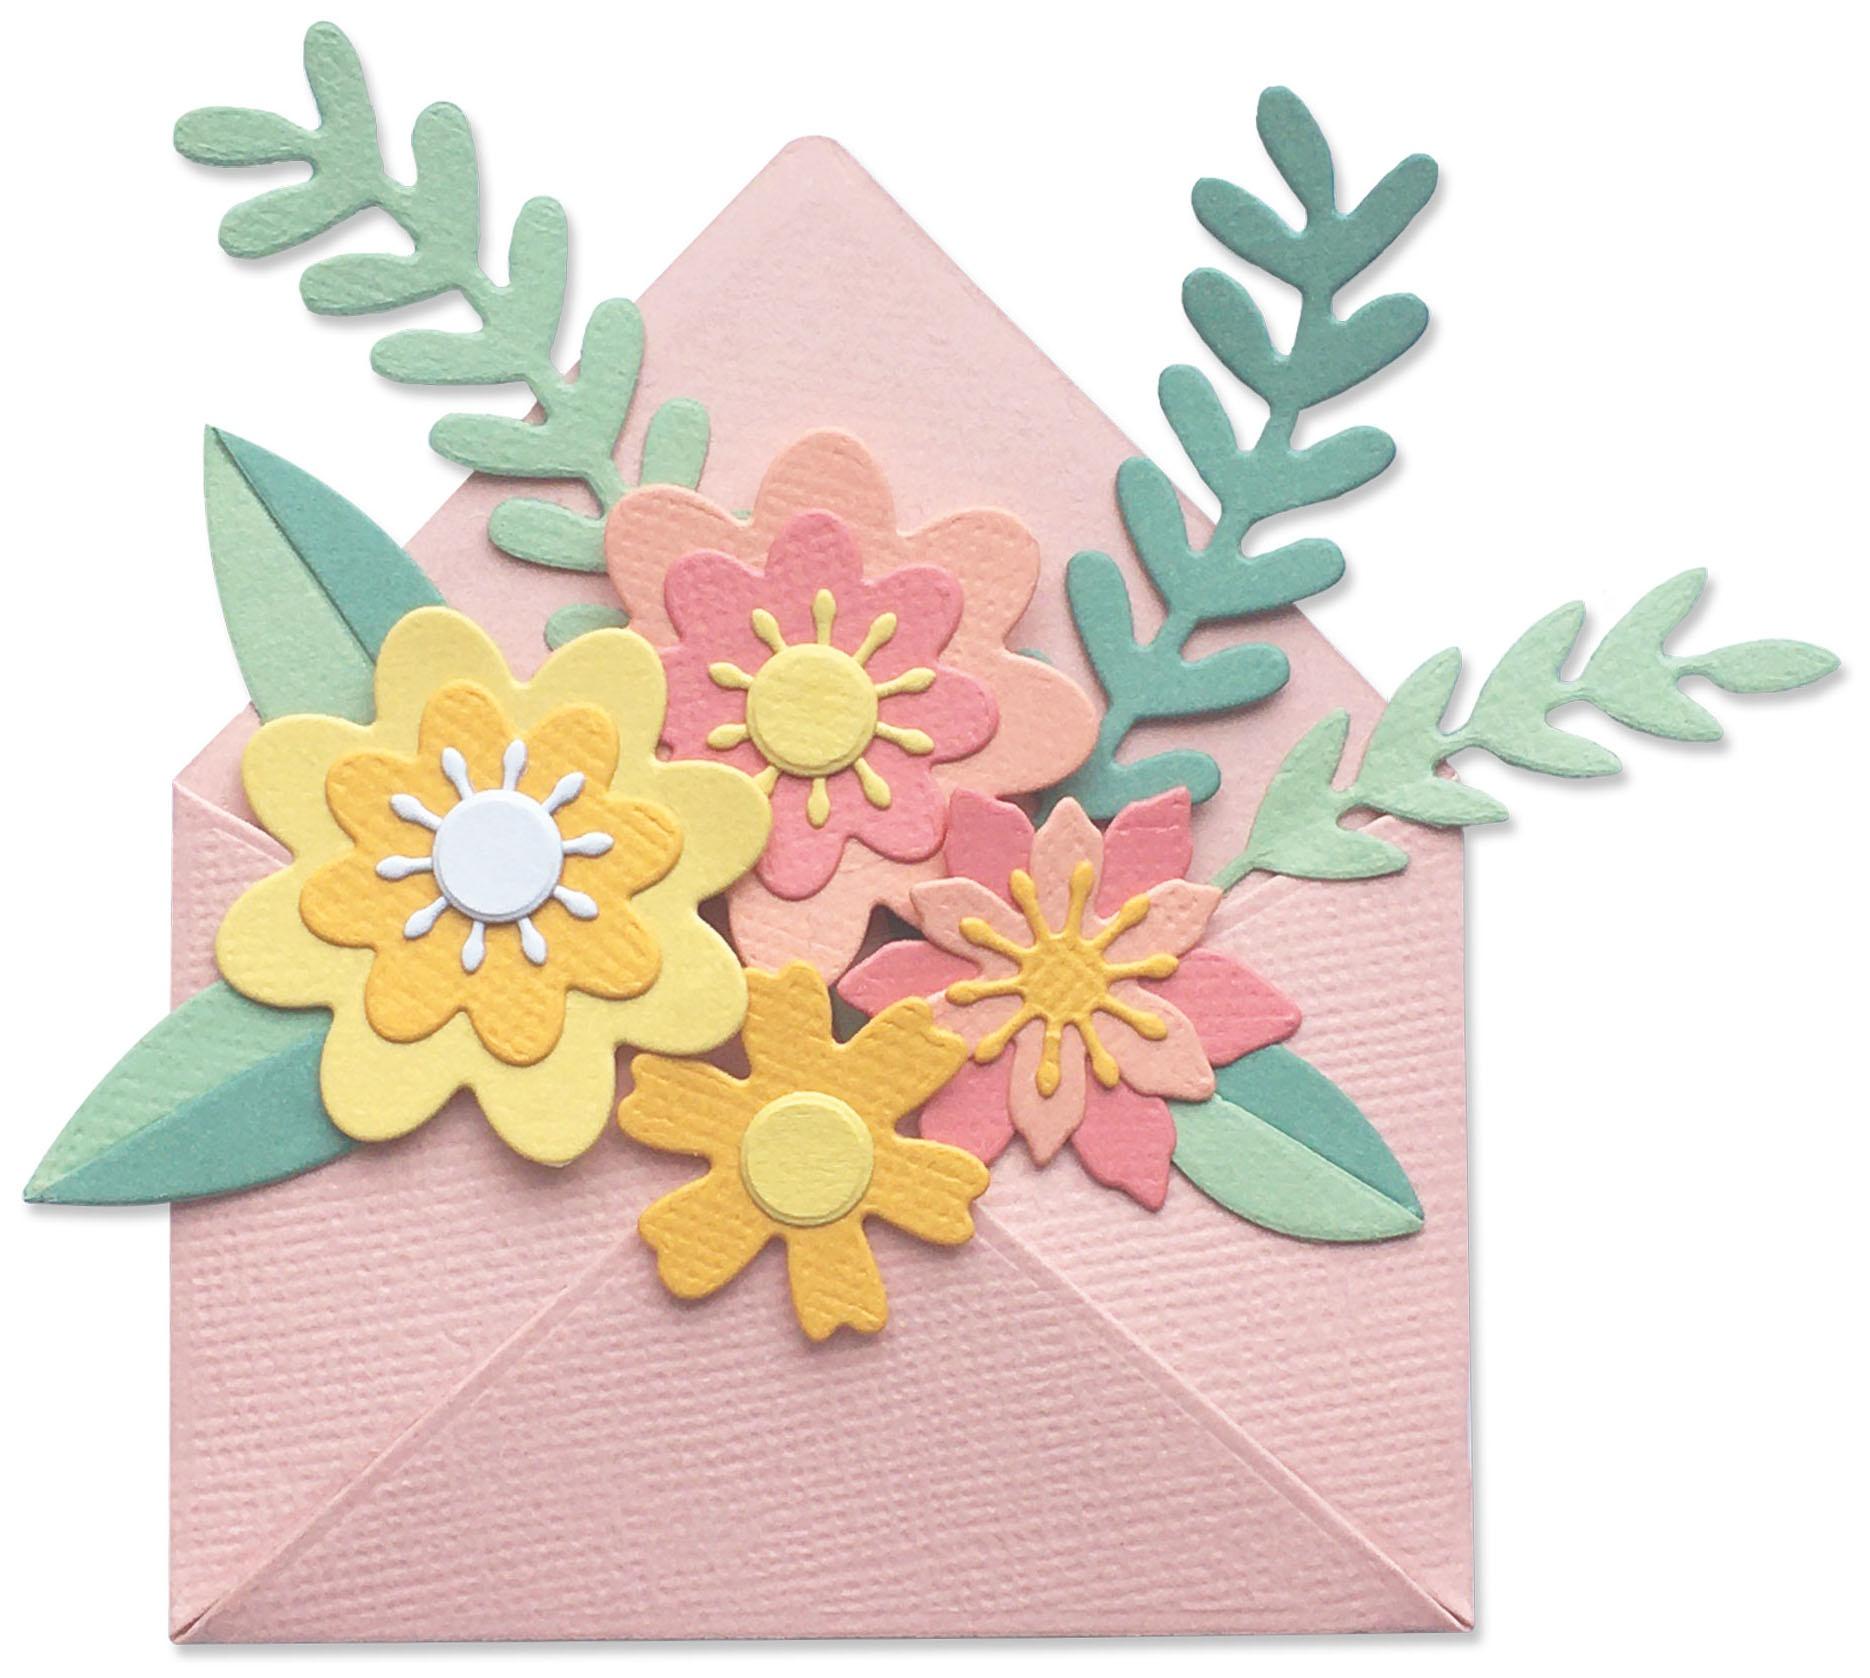 Sizzix Thinlits Dies - Flowers with Envelope